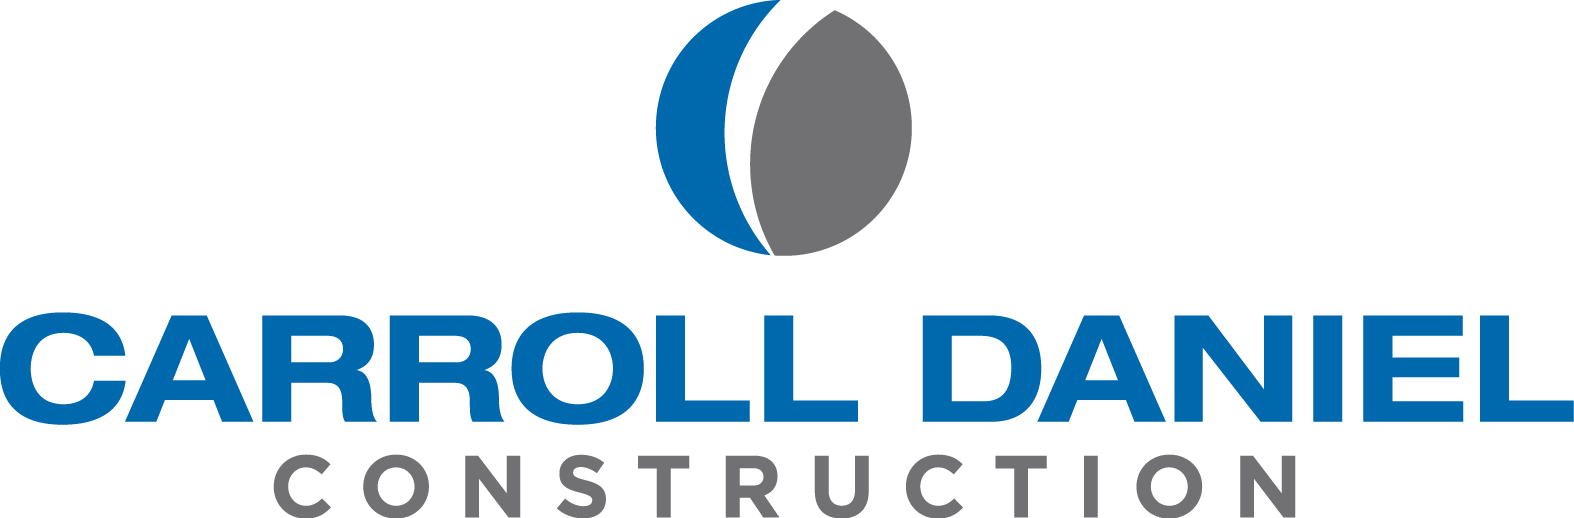 Carroll Daniel Construction logo